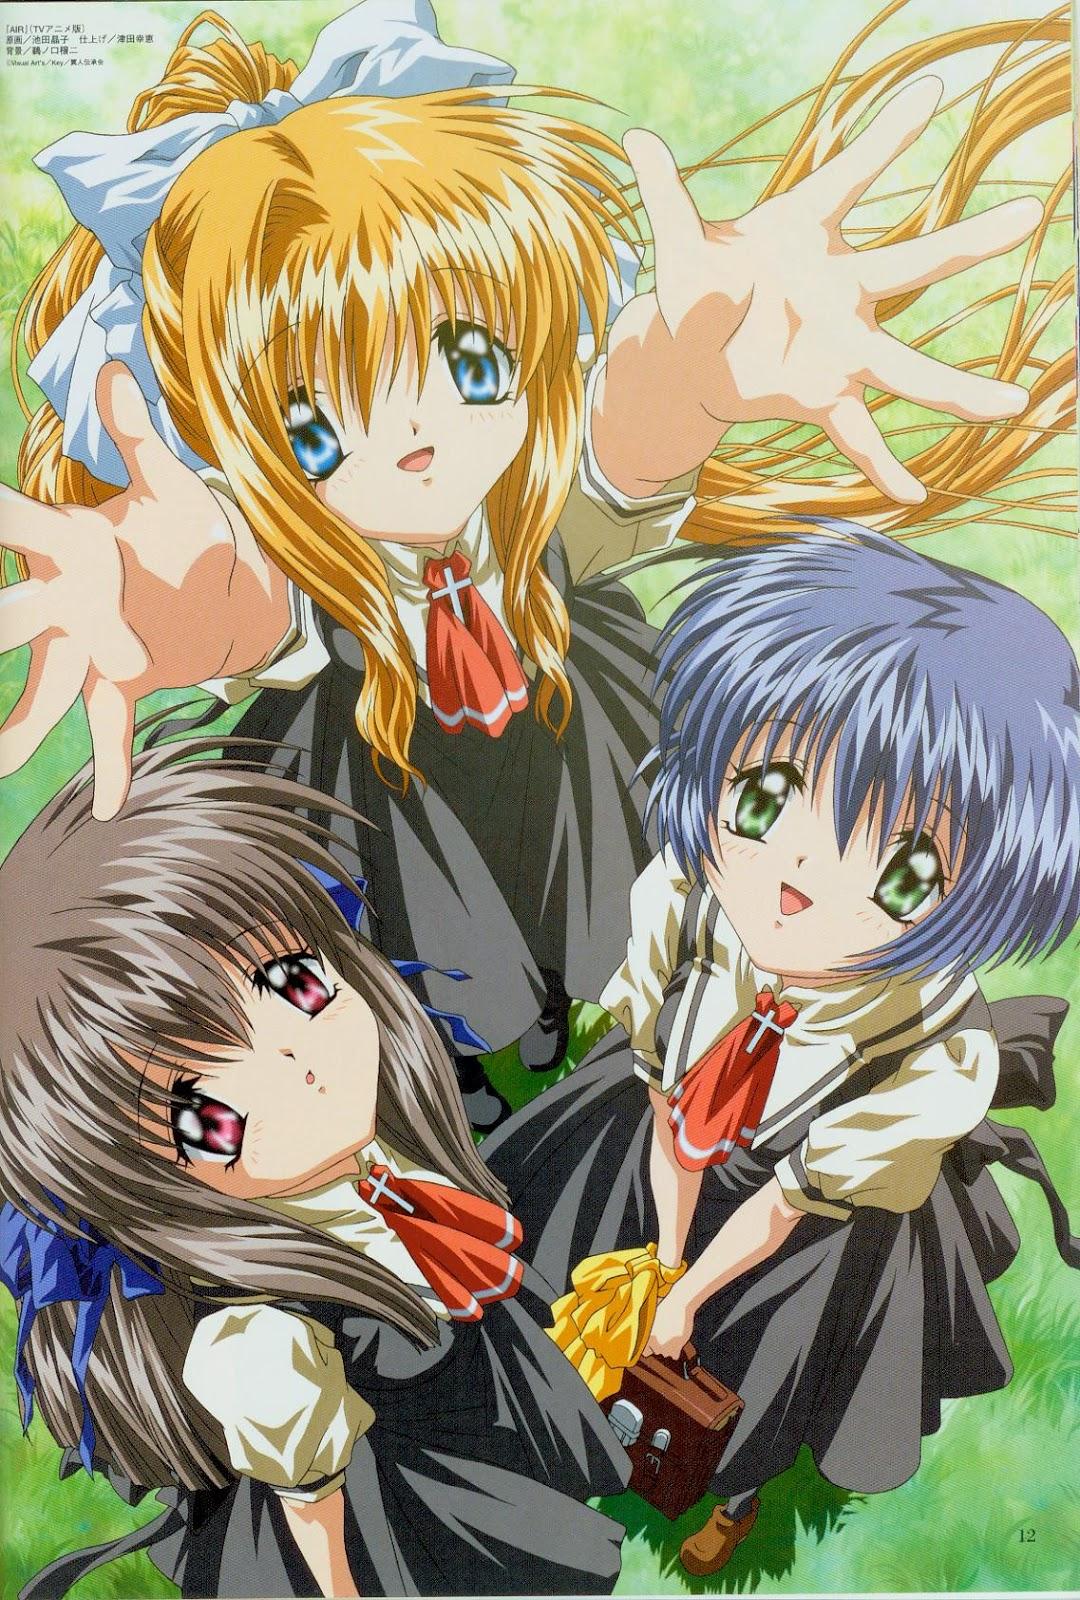 Moonlight Summoner S Anime Sekai Air